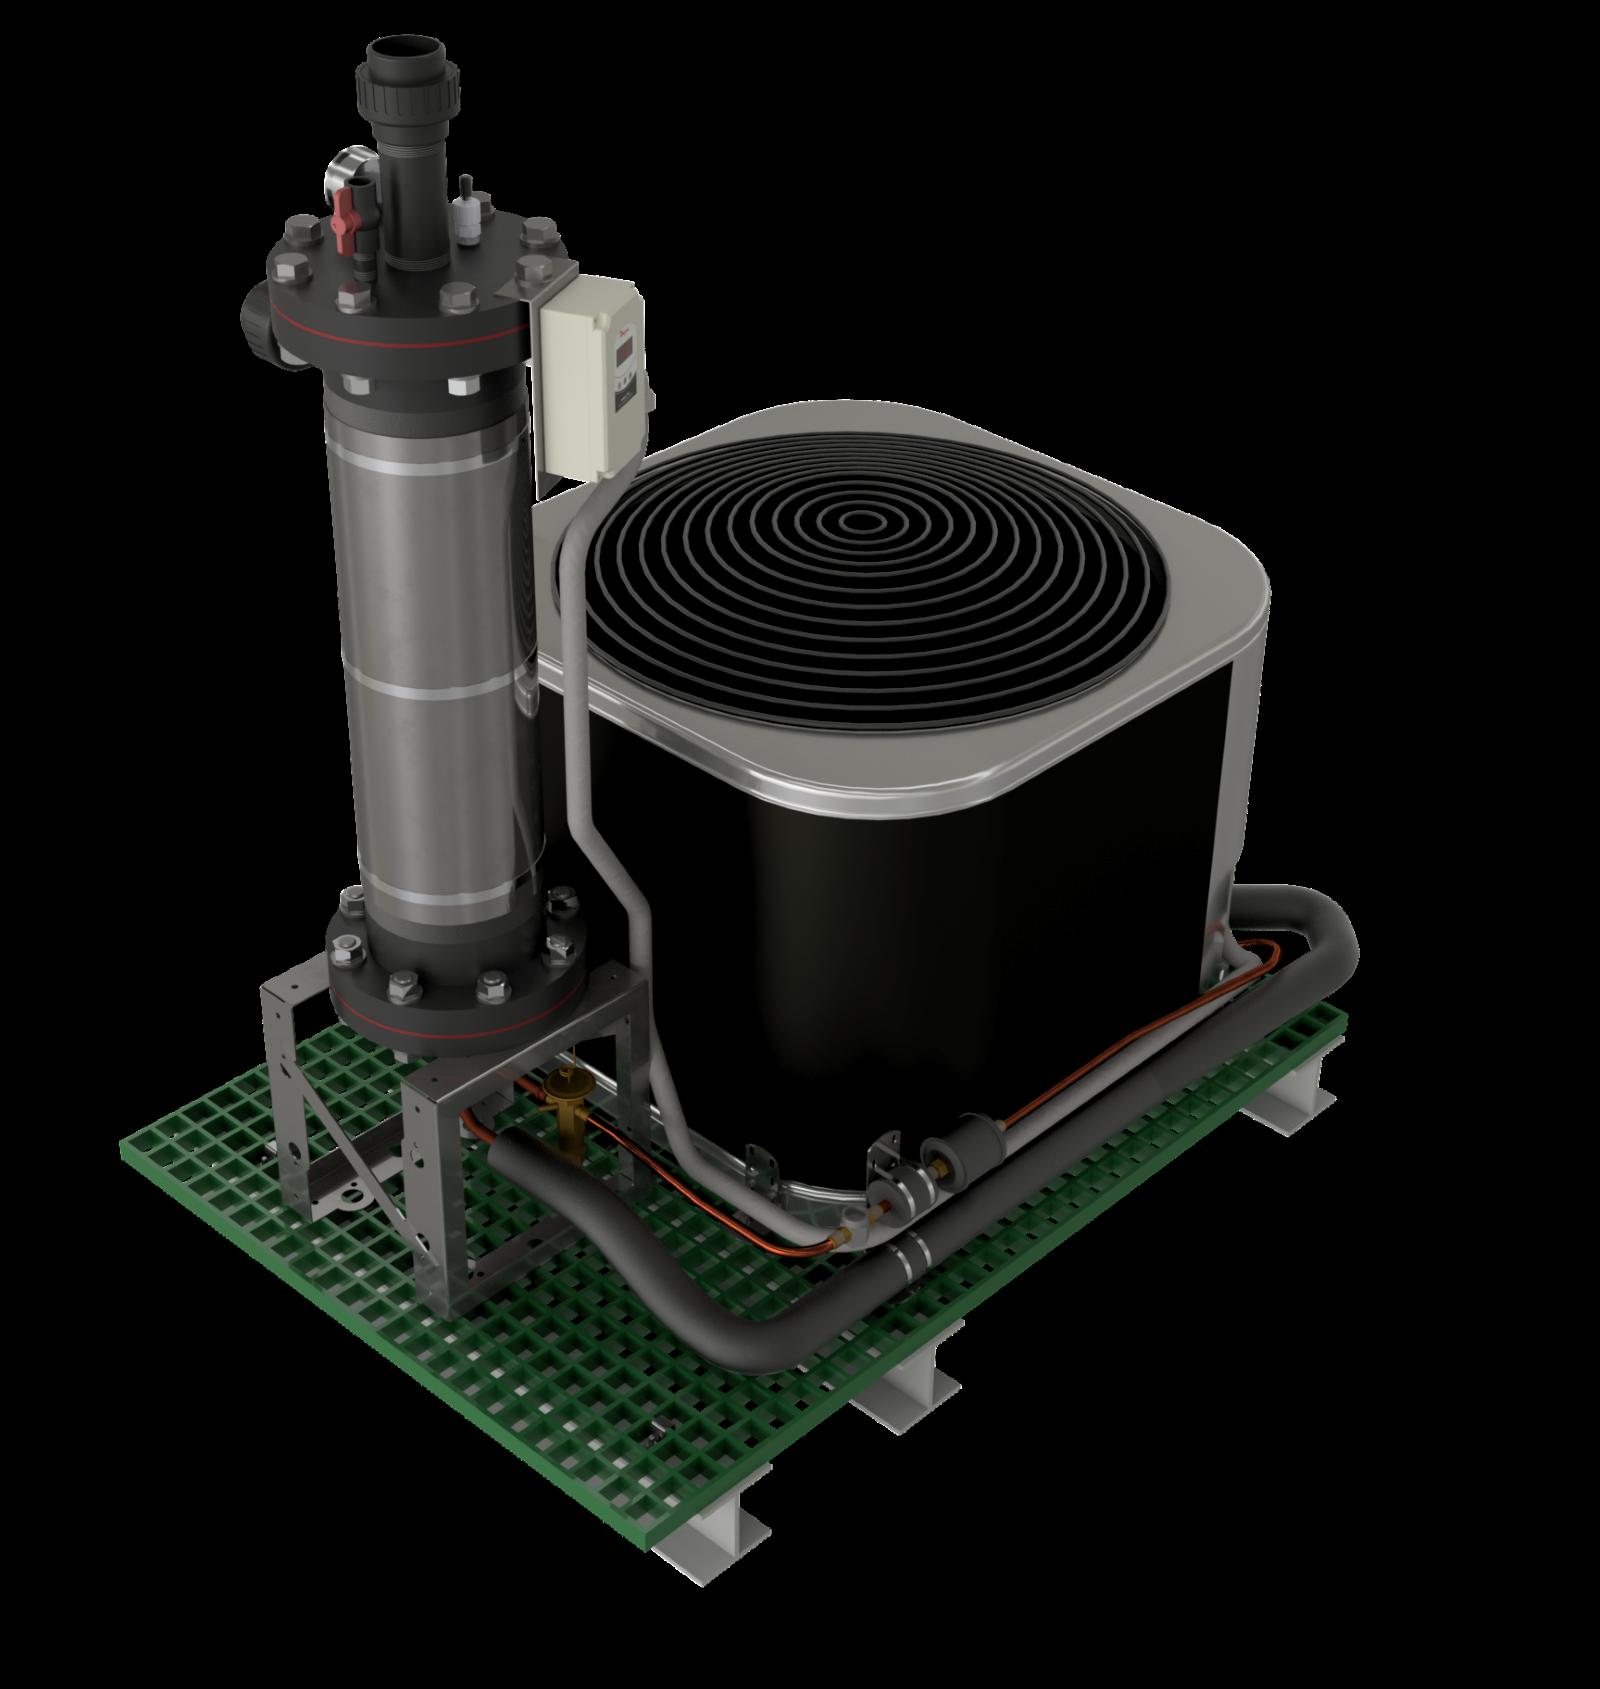 5 ton Commercial Chillers & Heat Pumps